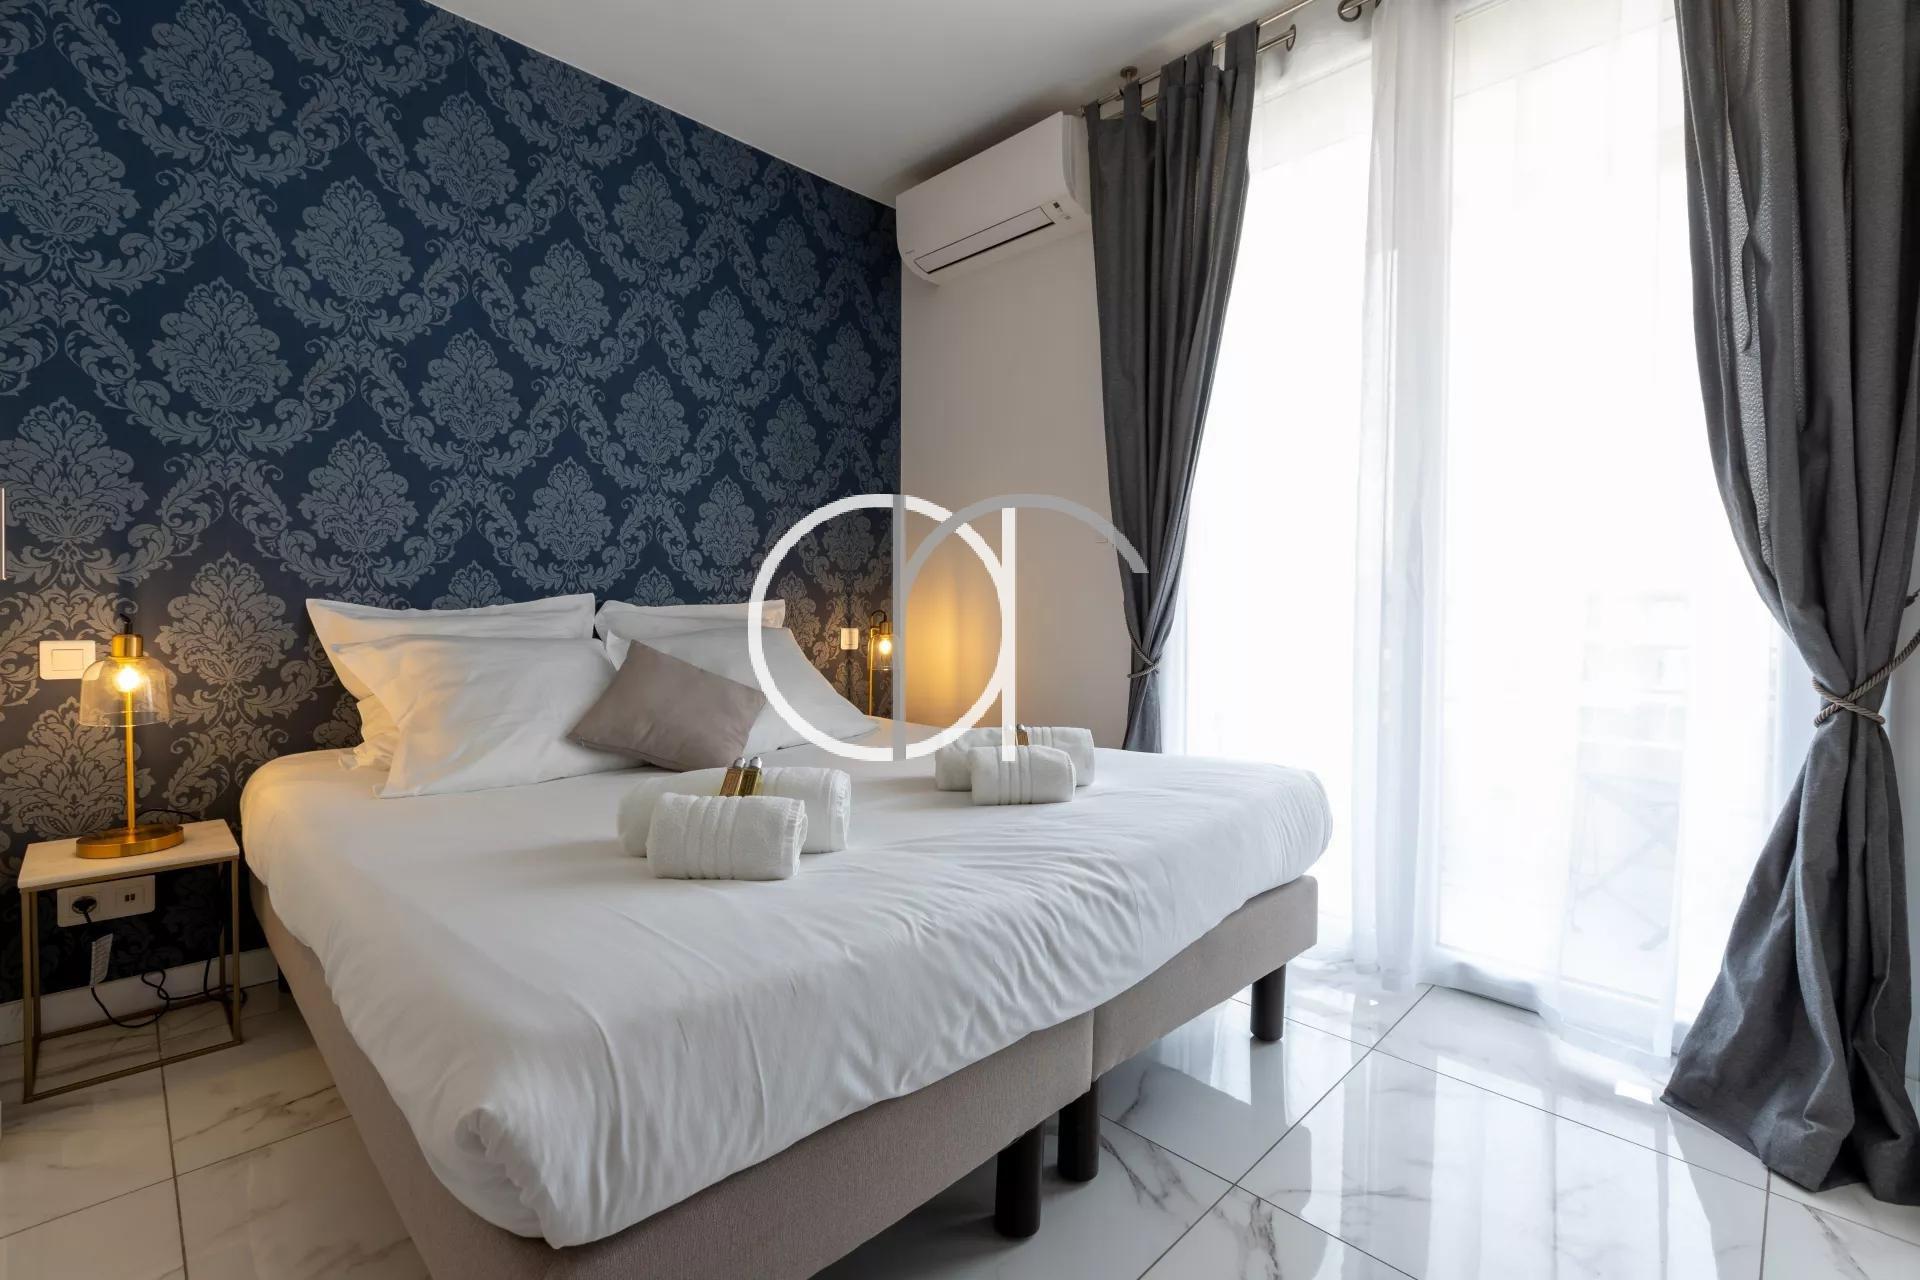 GRAND HOTEL - STUDIO AVC TERRASSE